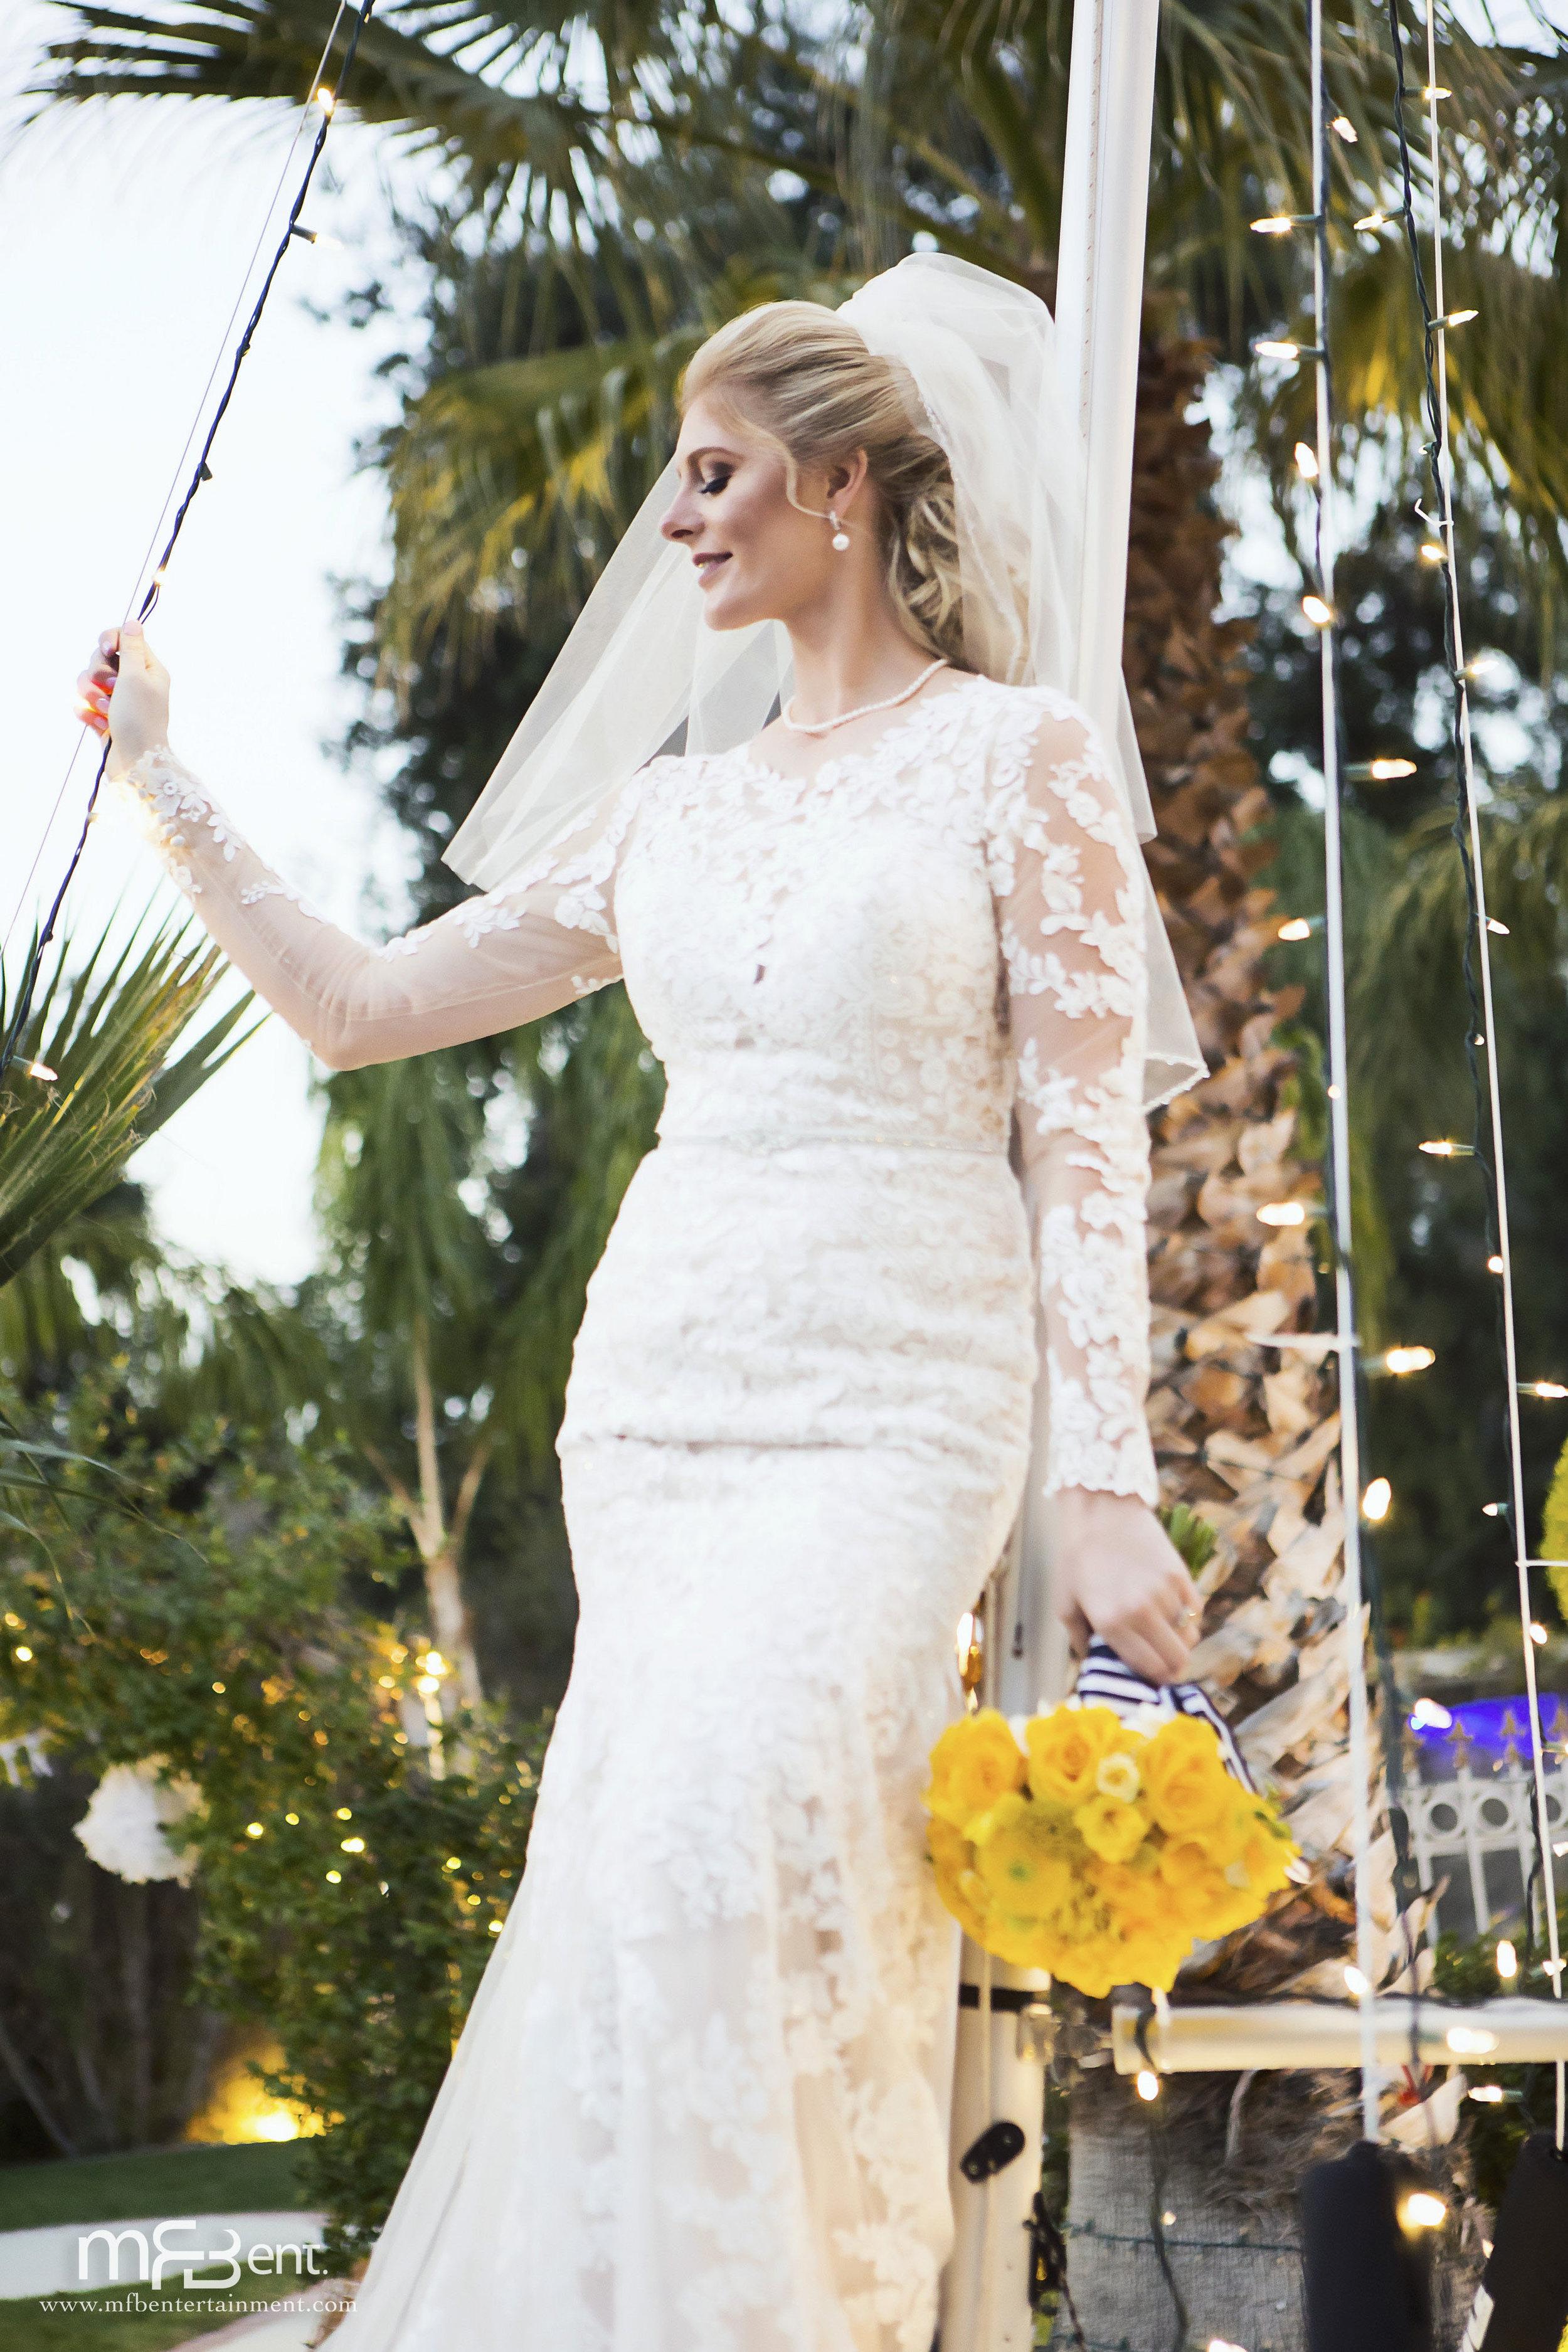 PIOTR CHELSEA WEDDING-PHOTO SESSION-0046 L.jpg